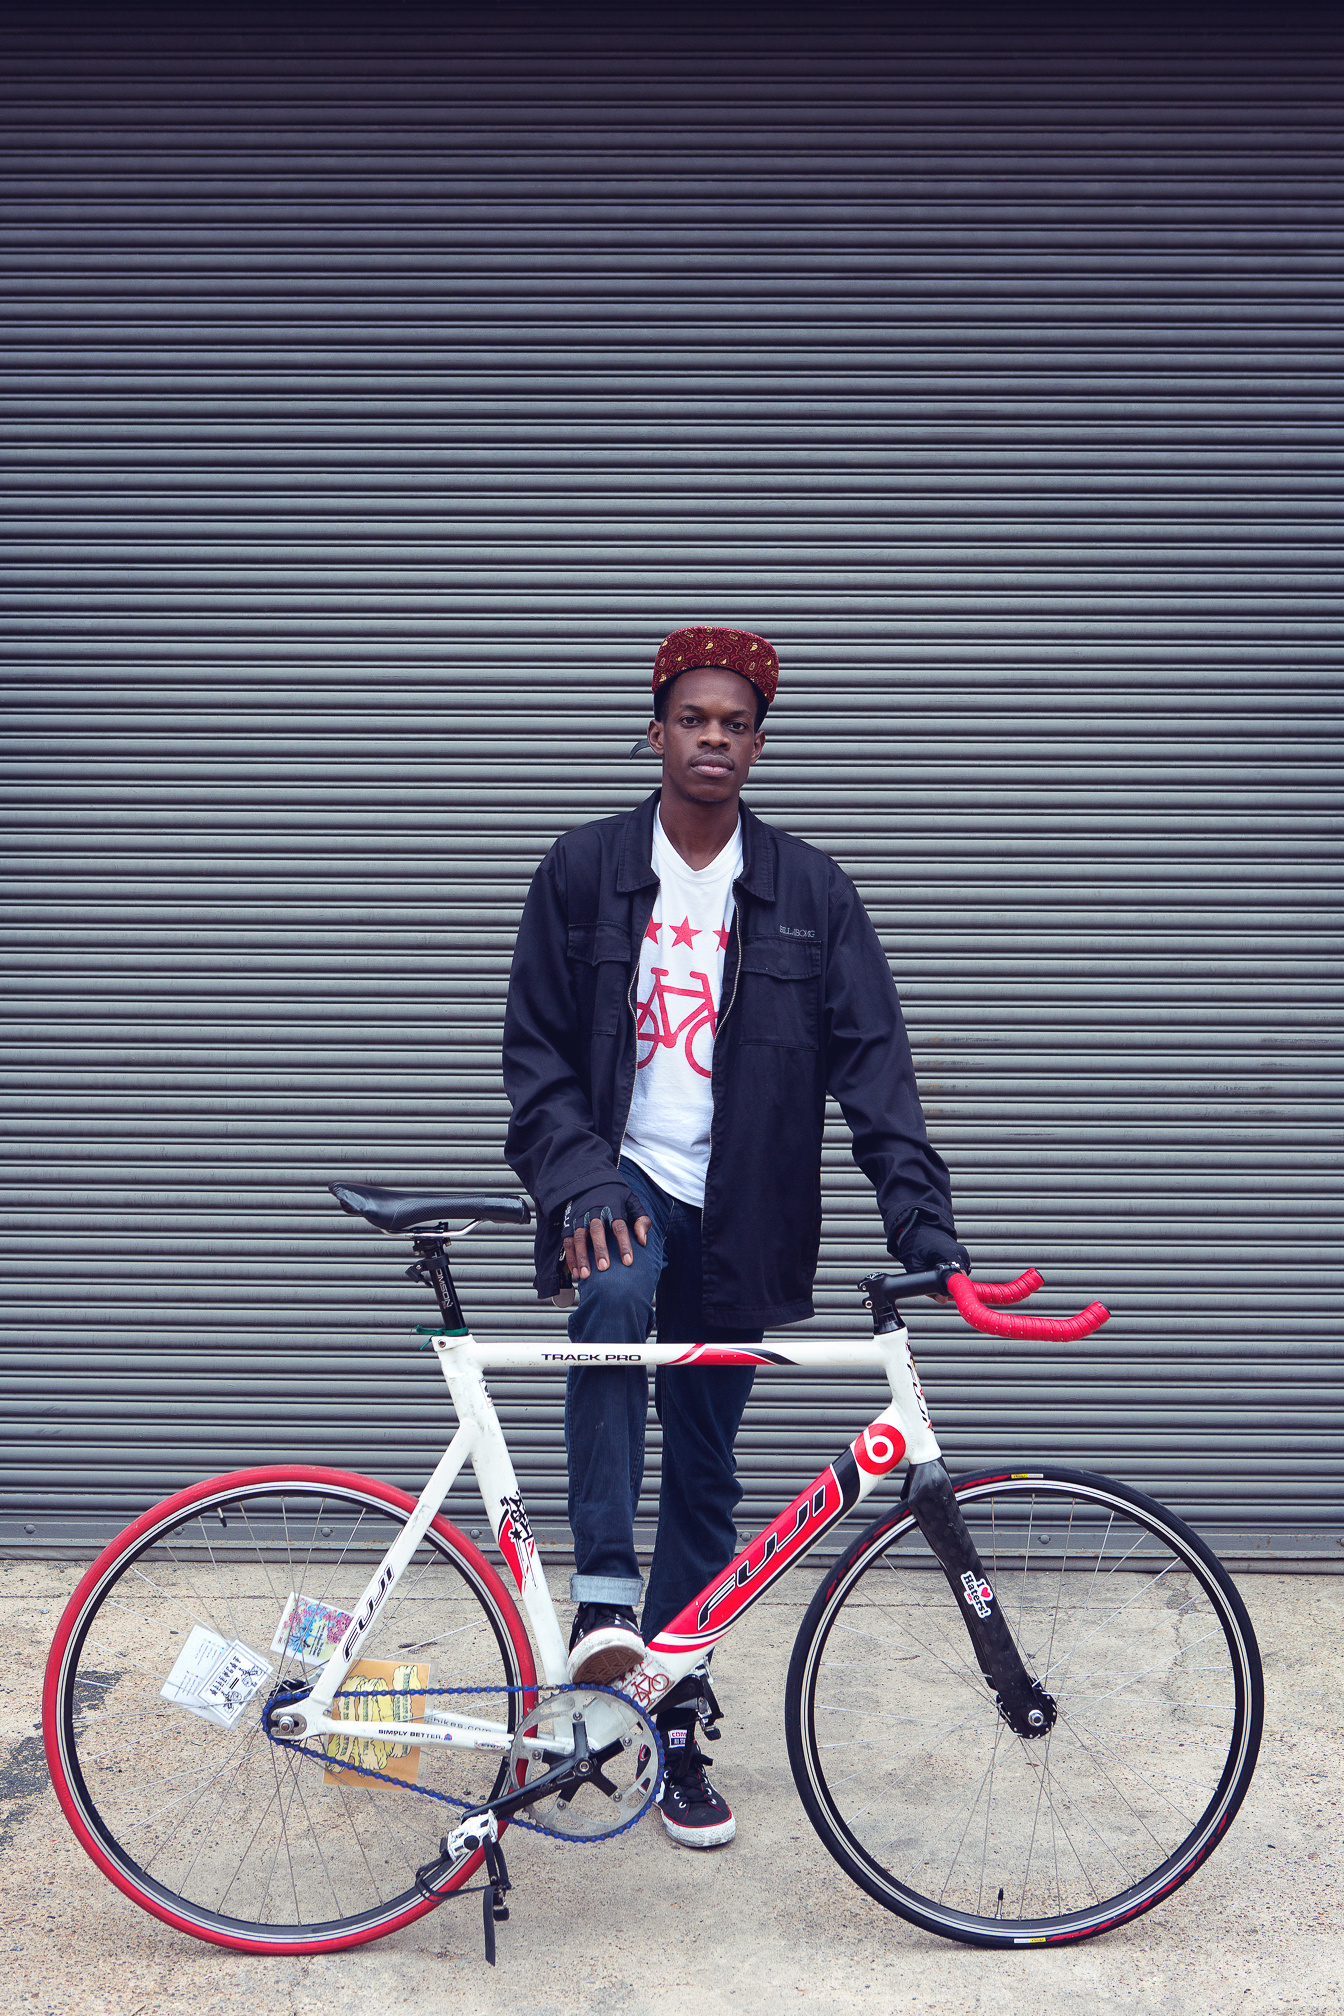 Washington D.C. Bike Messengers